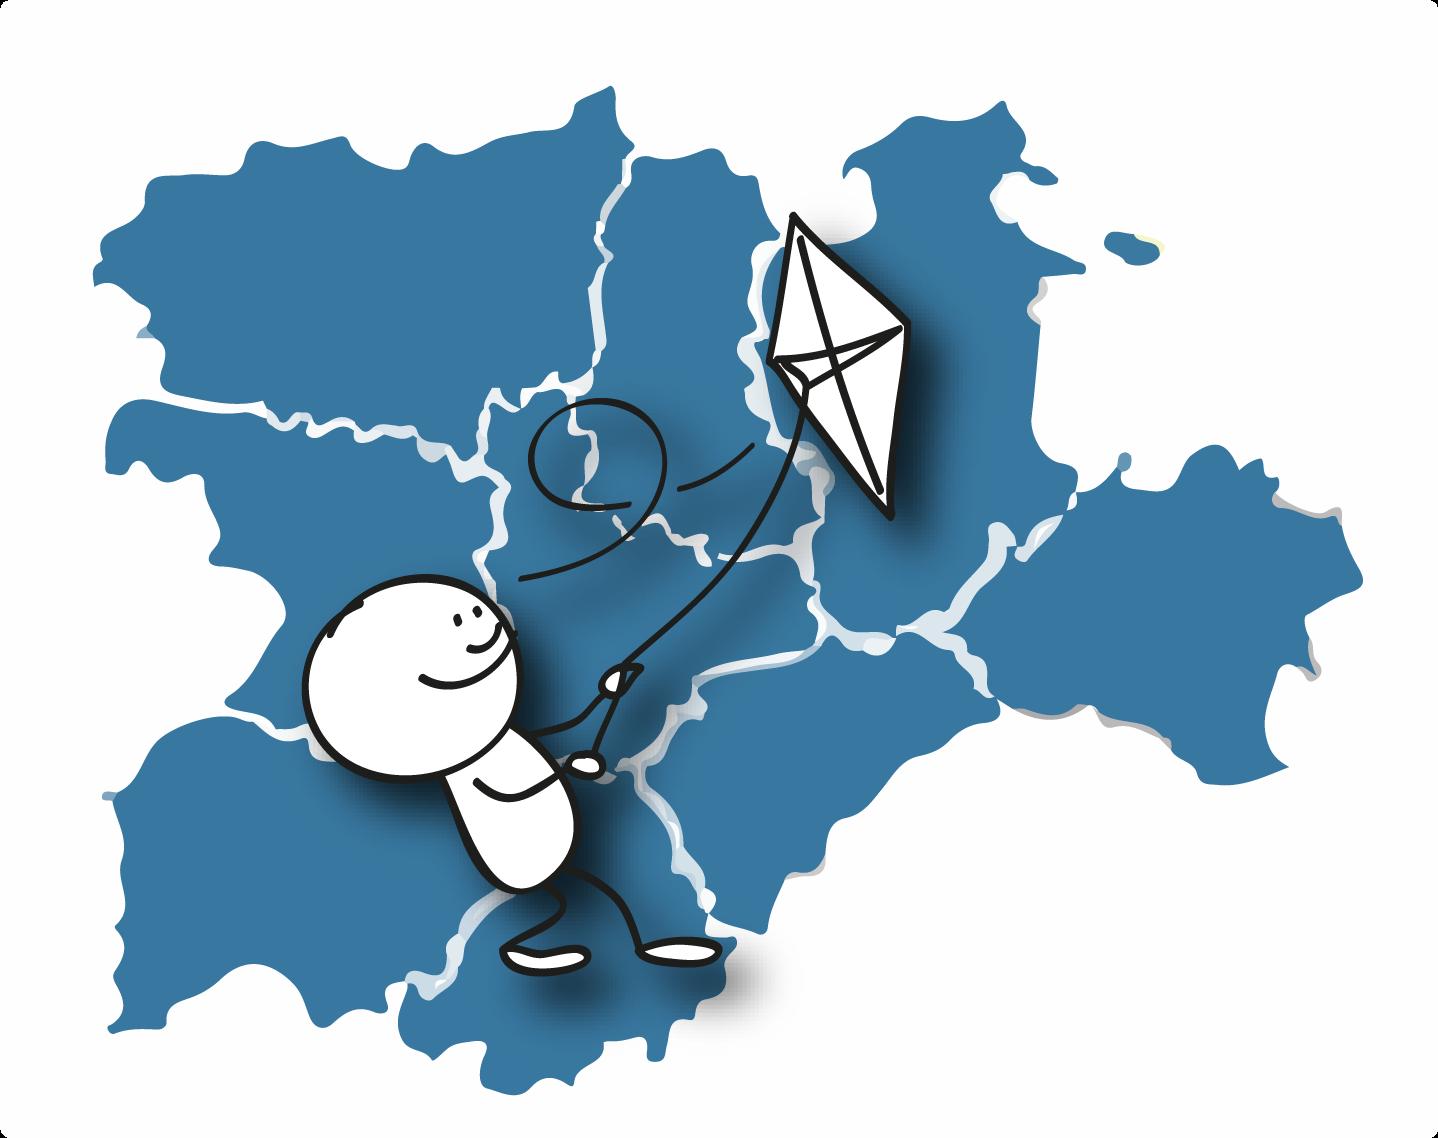 mapaCylgrande